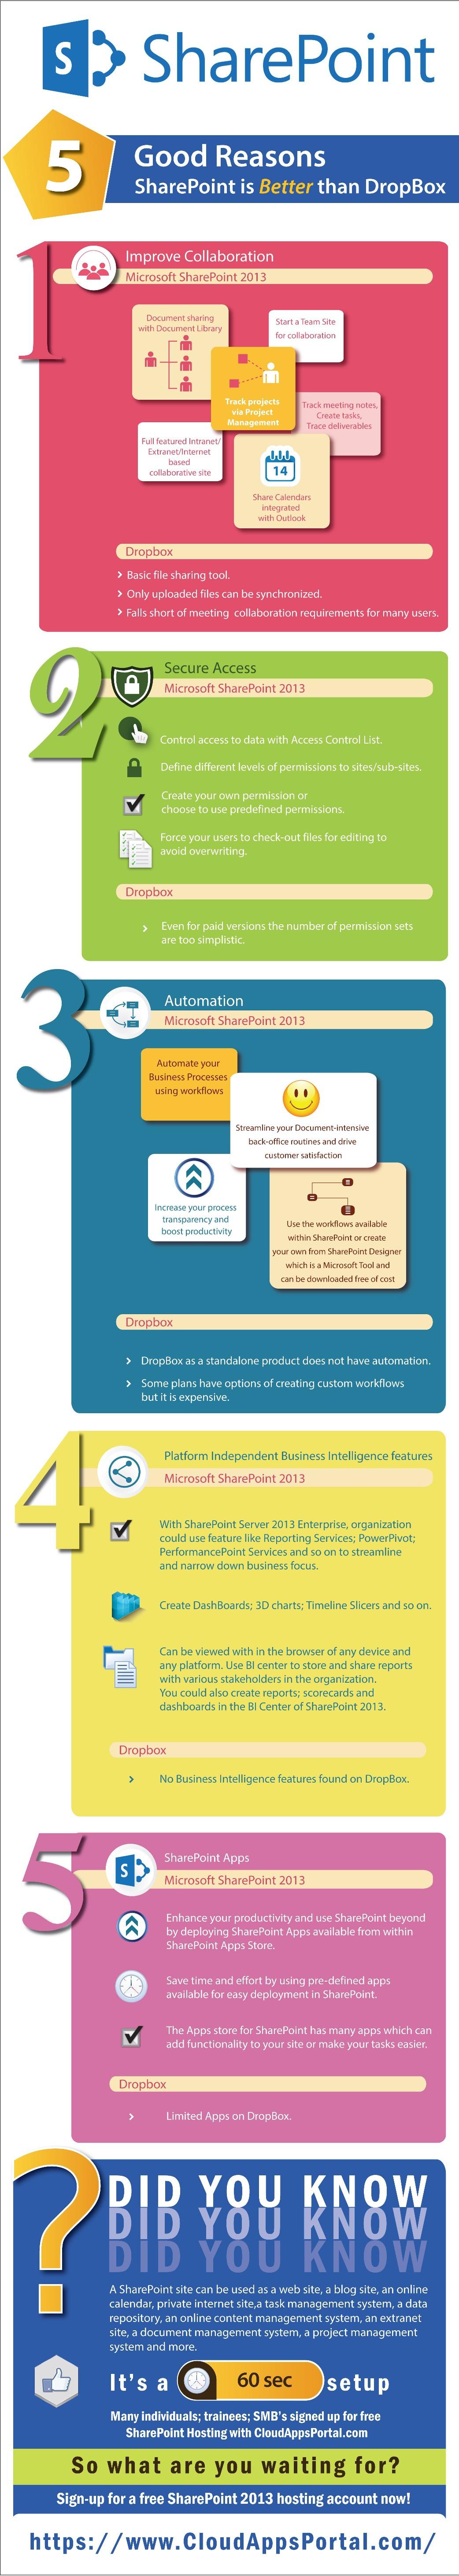 5 Good Reasons SharePoint is Better than DropBox